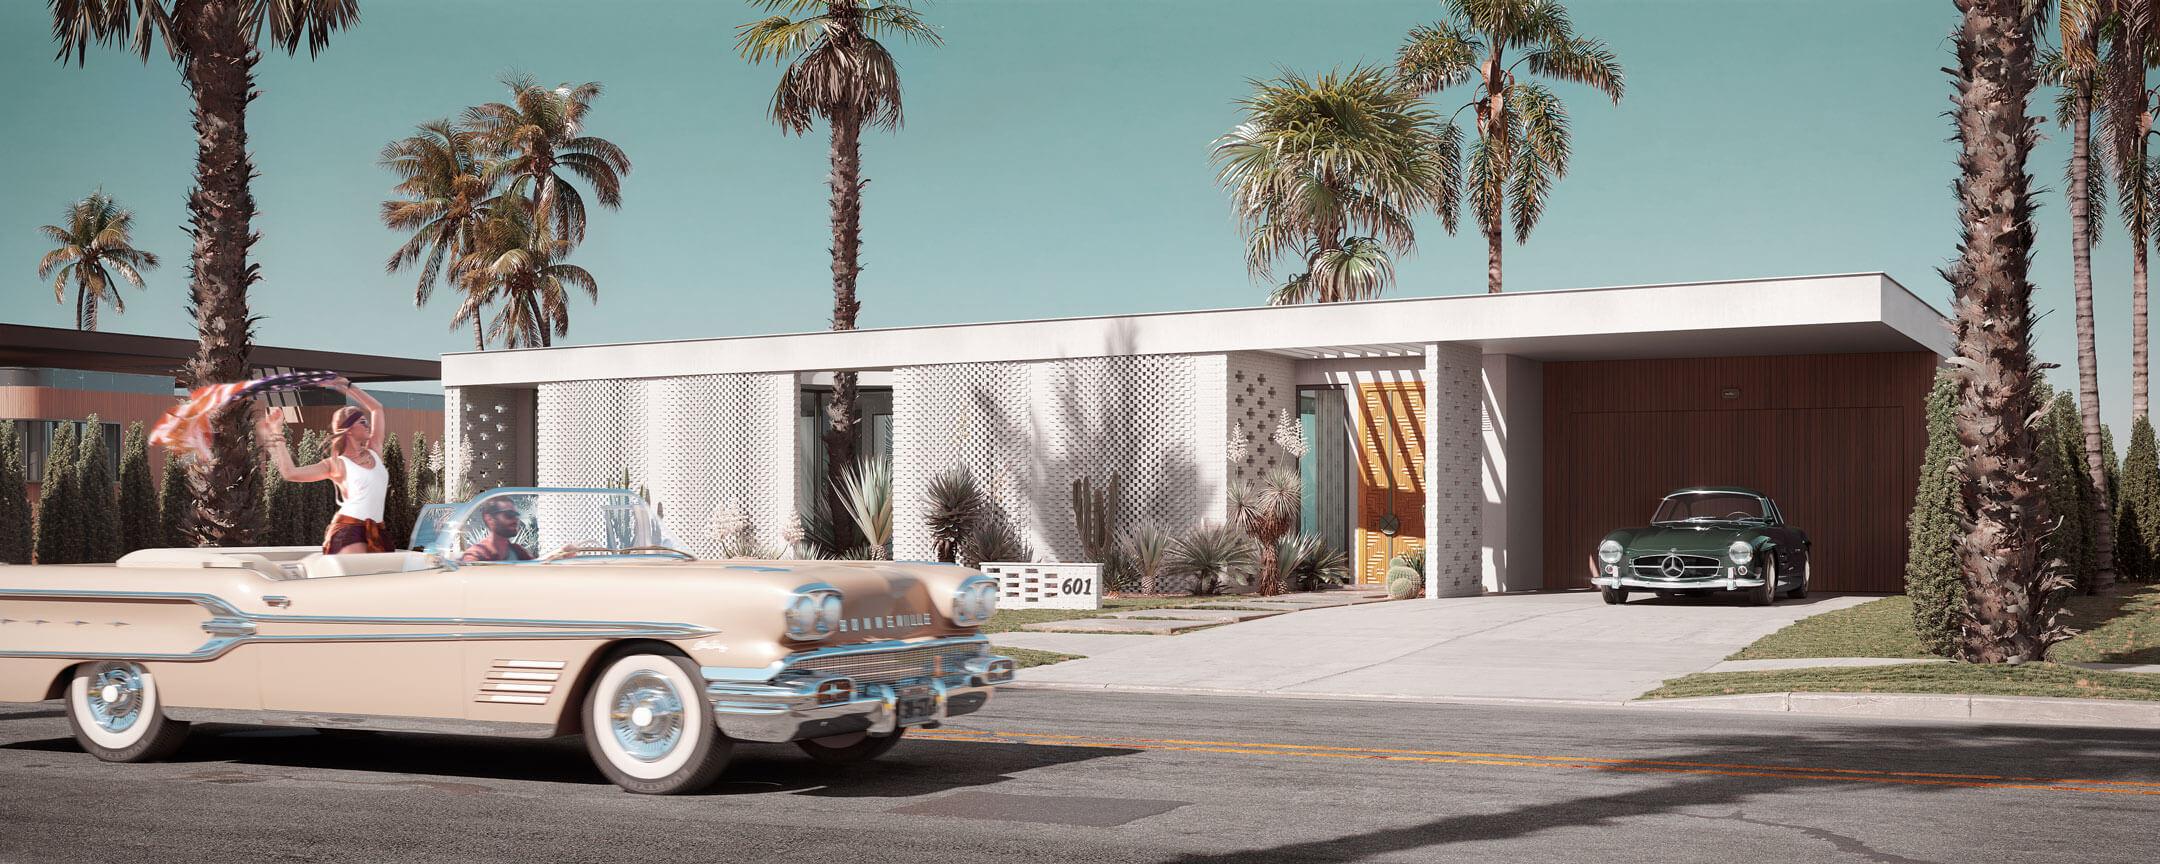 Photorealistic 3D Concept Design Rendering